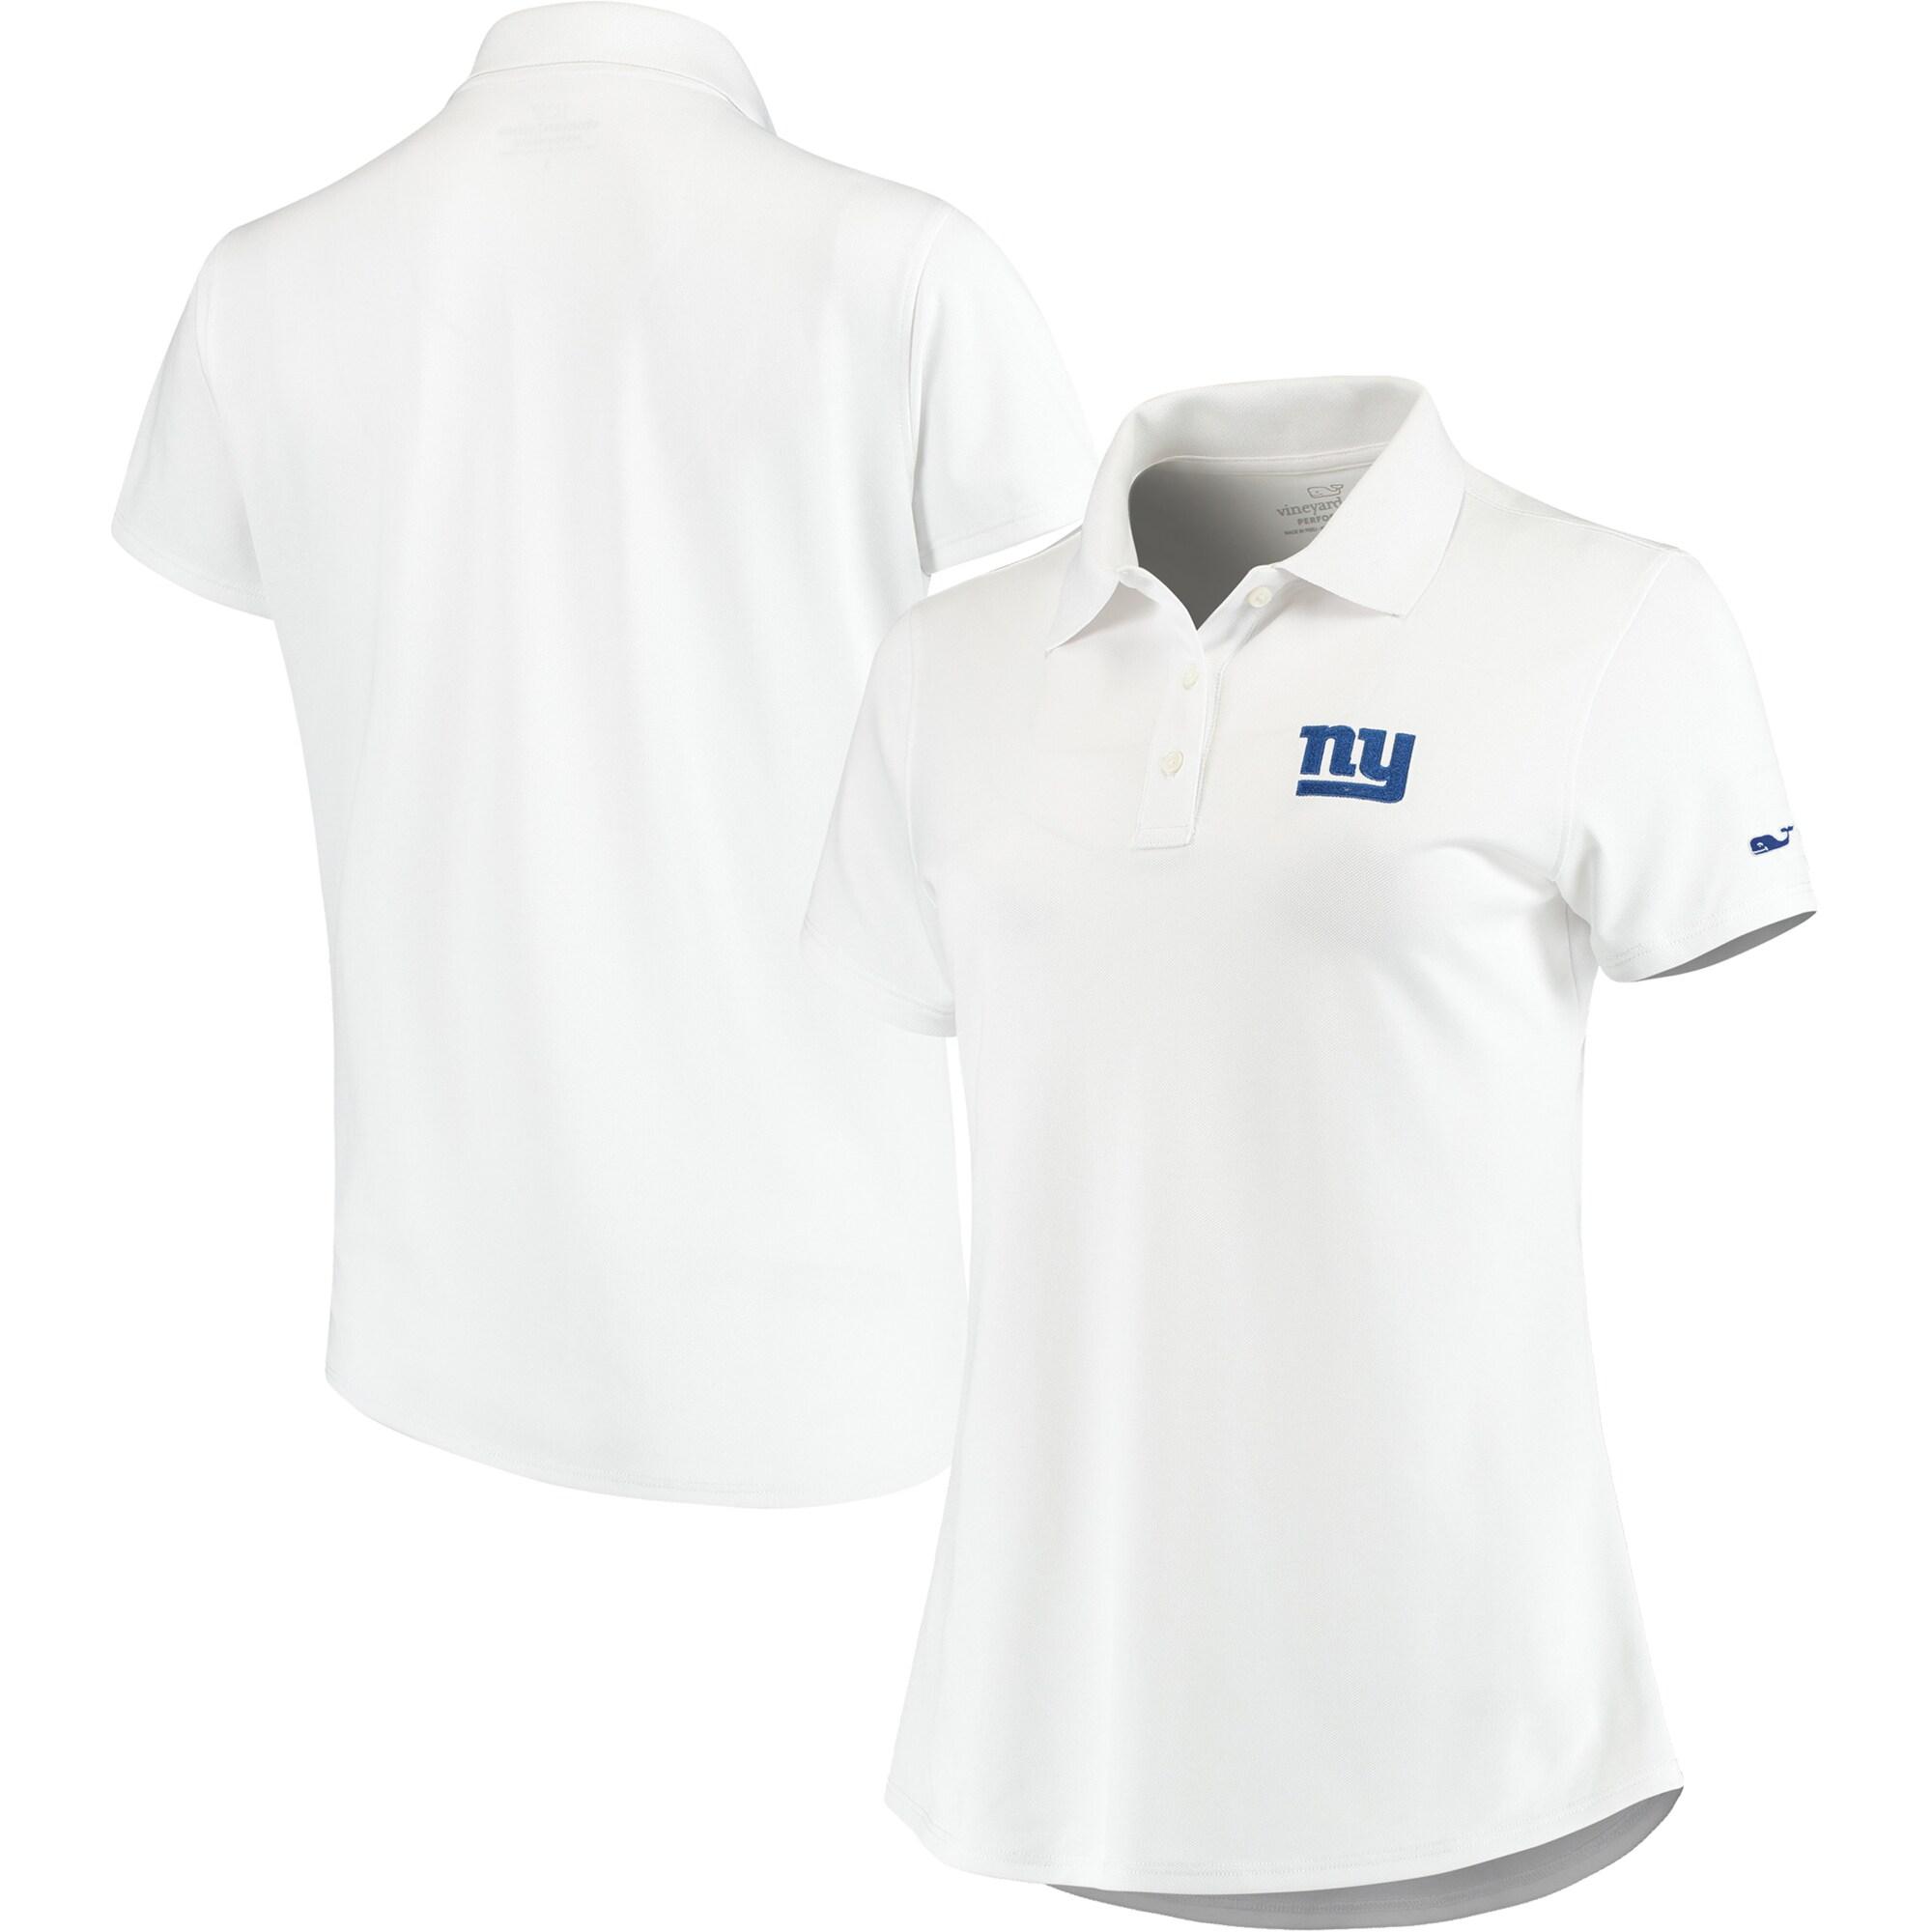 New York Giants Vineyard Vines Women's Pique Sport Performance Polo - White